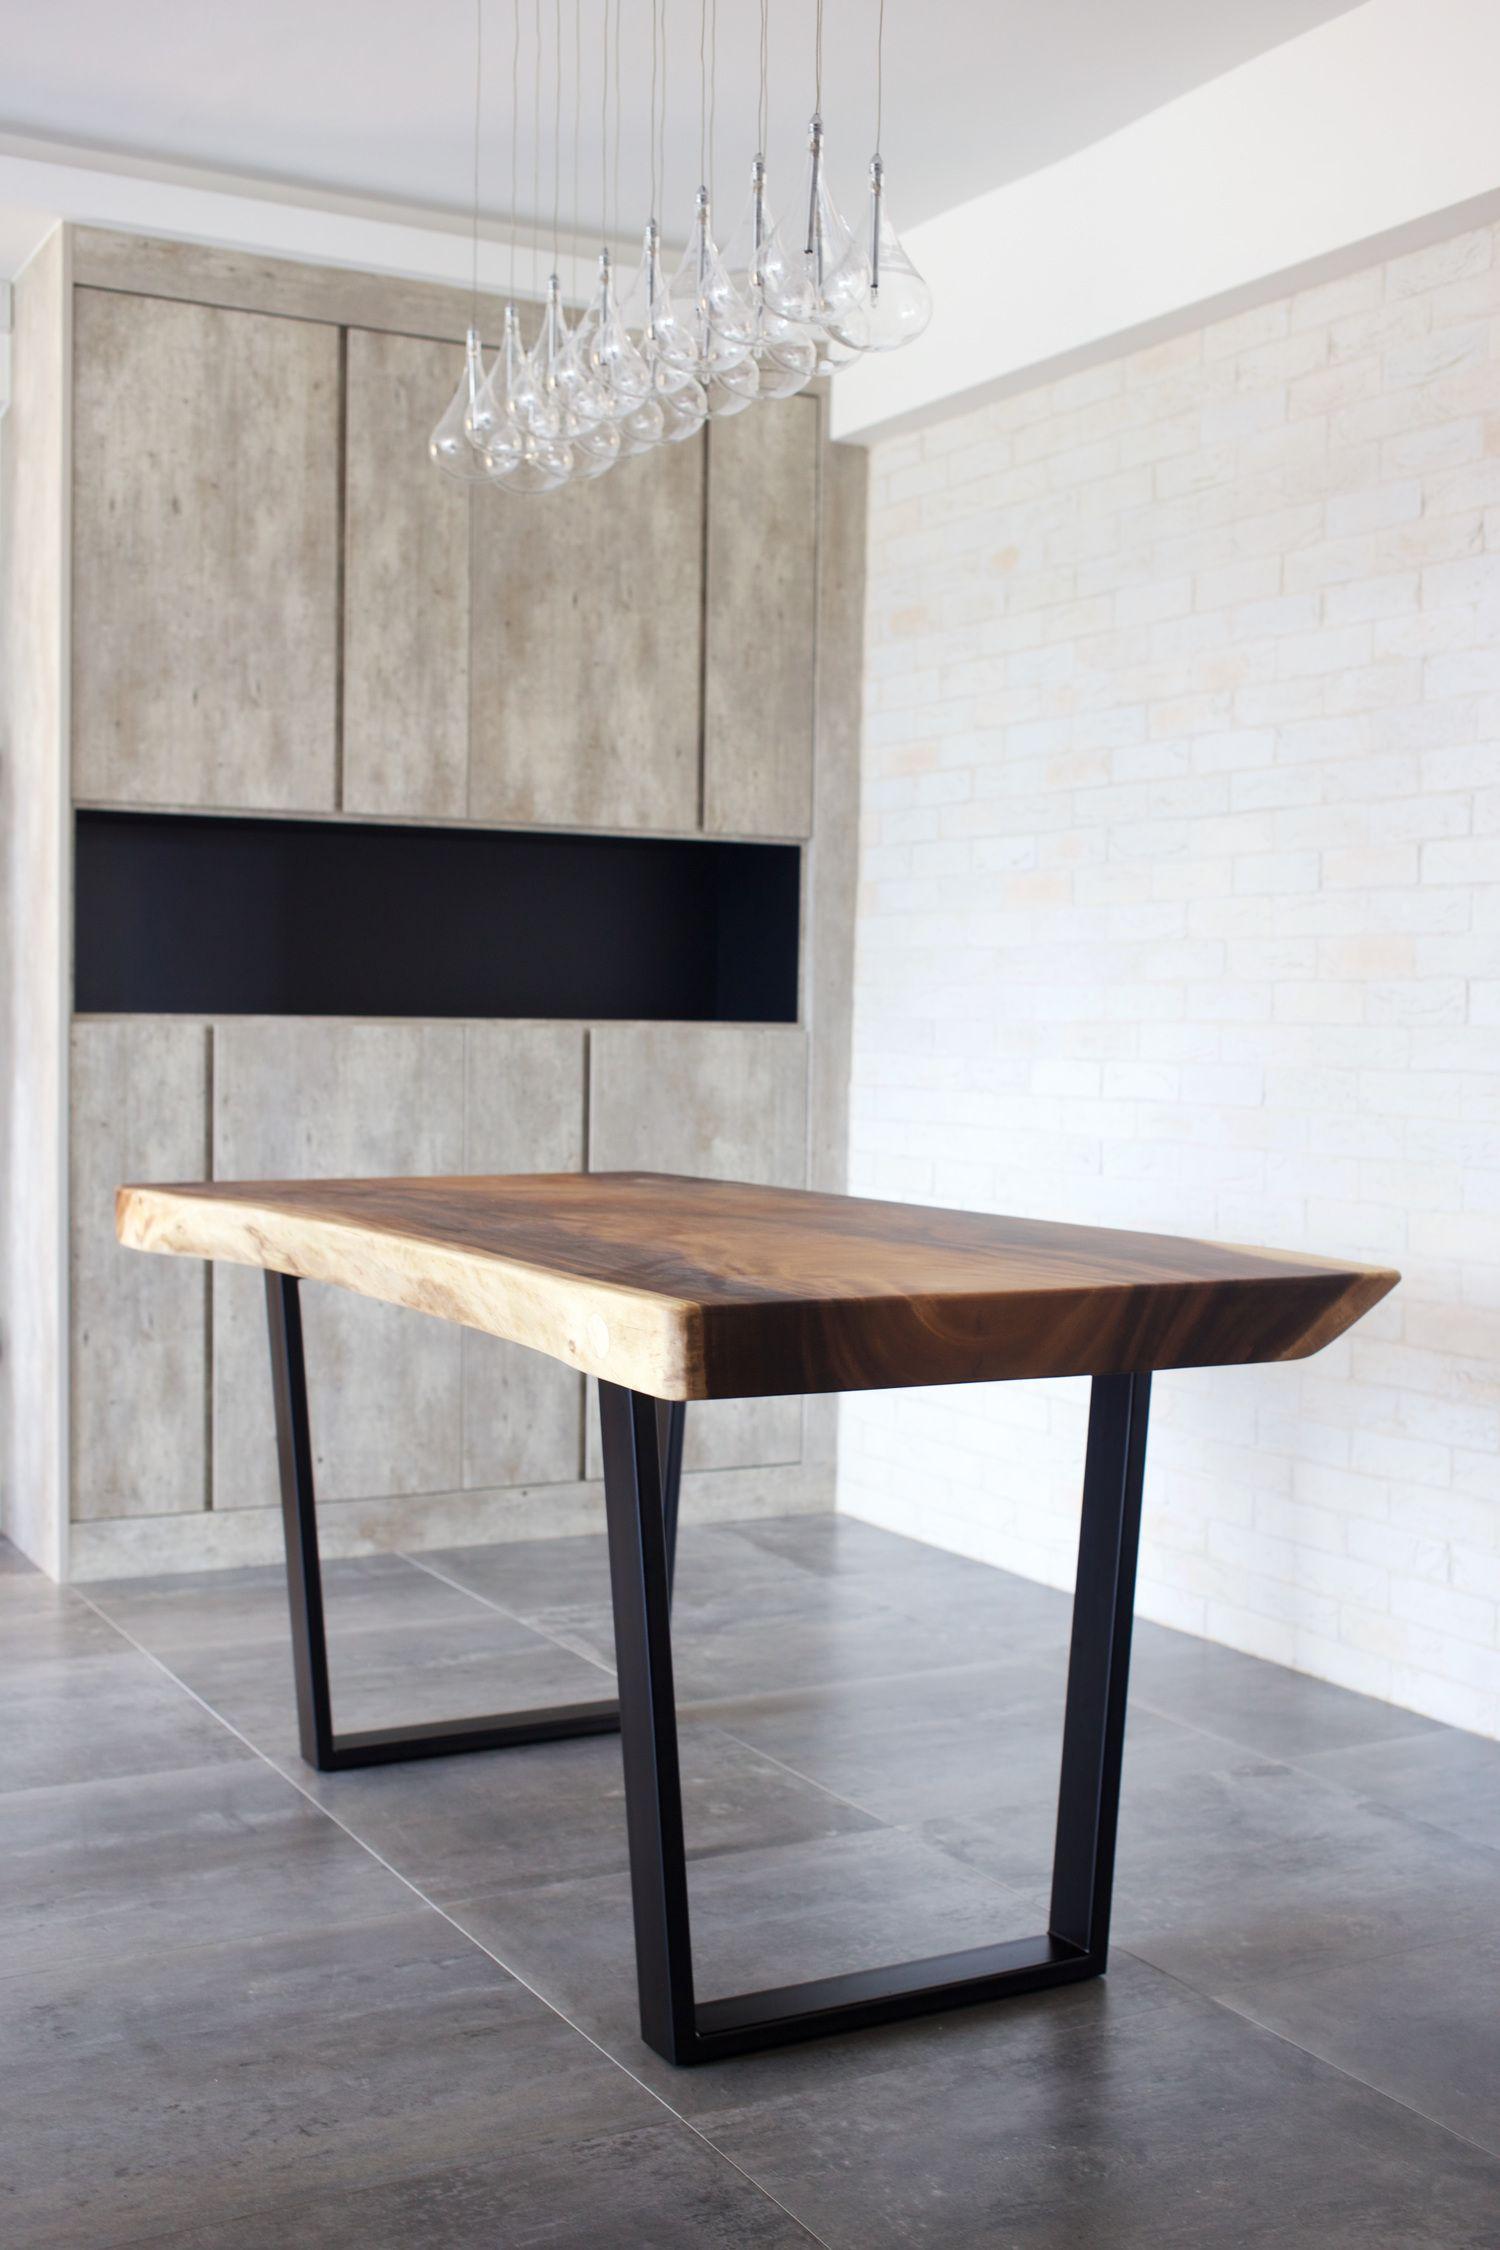 Herman Signature Series Solid Wood Tables Herman Furniture Singapore Solid Wood Slabs Specialist In 2020 Metal Leg Dining Table Wood Table Solid Wood Table